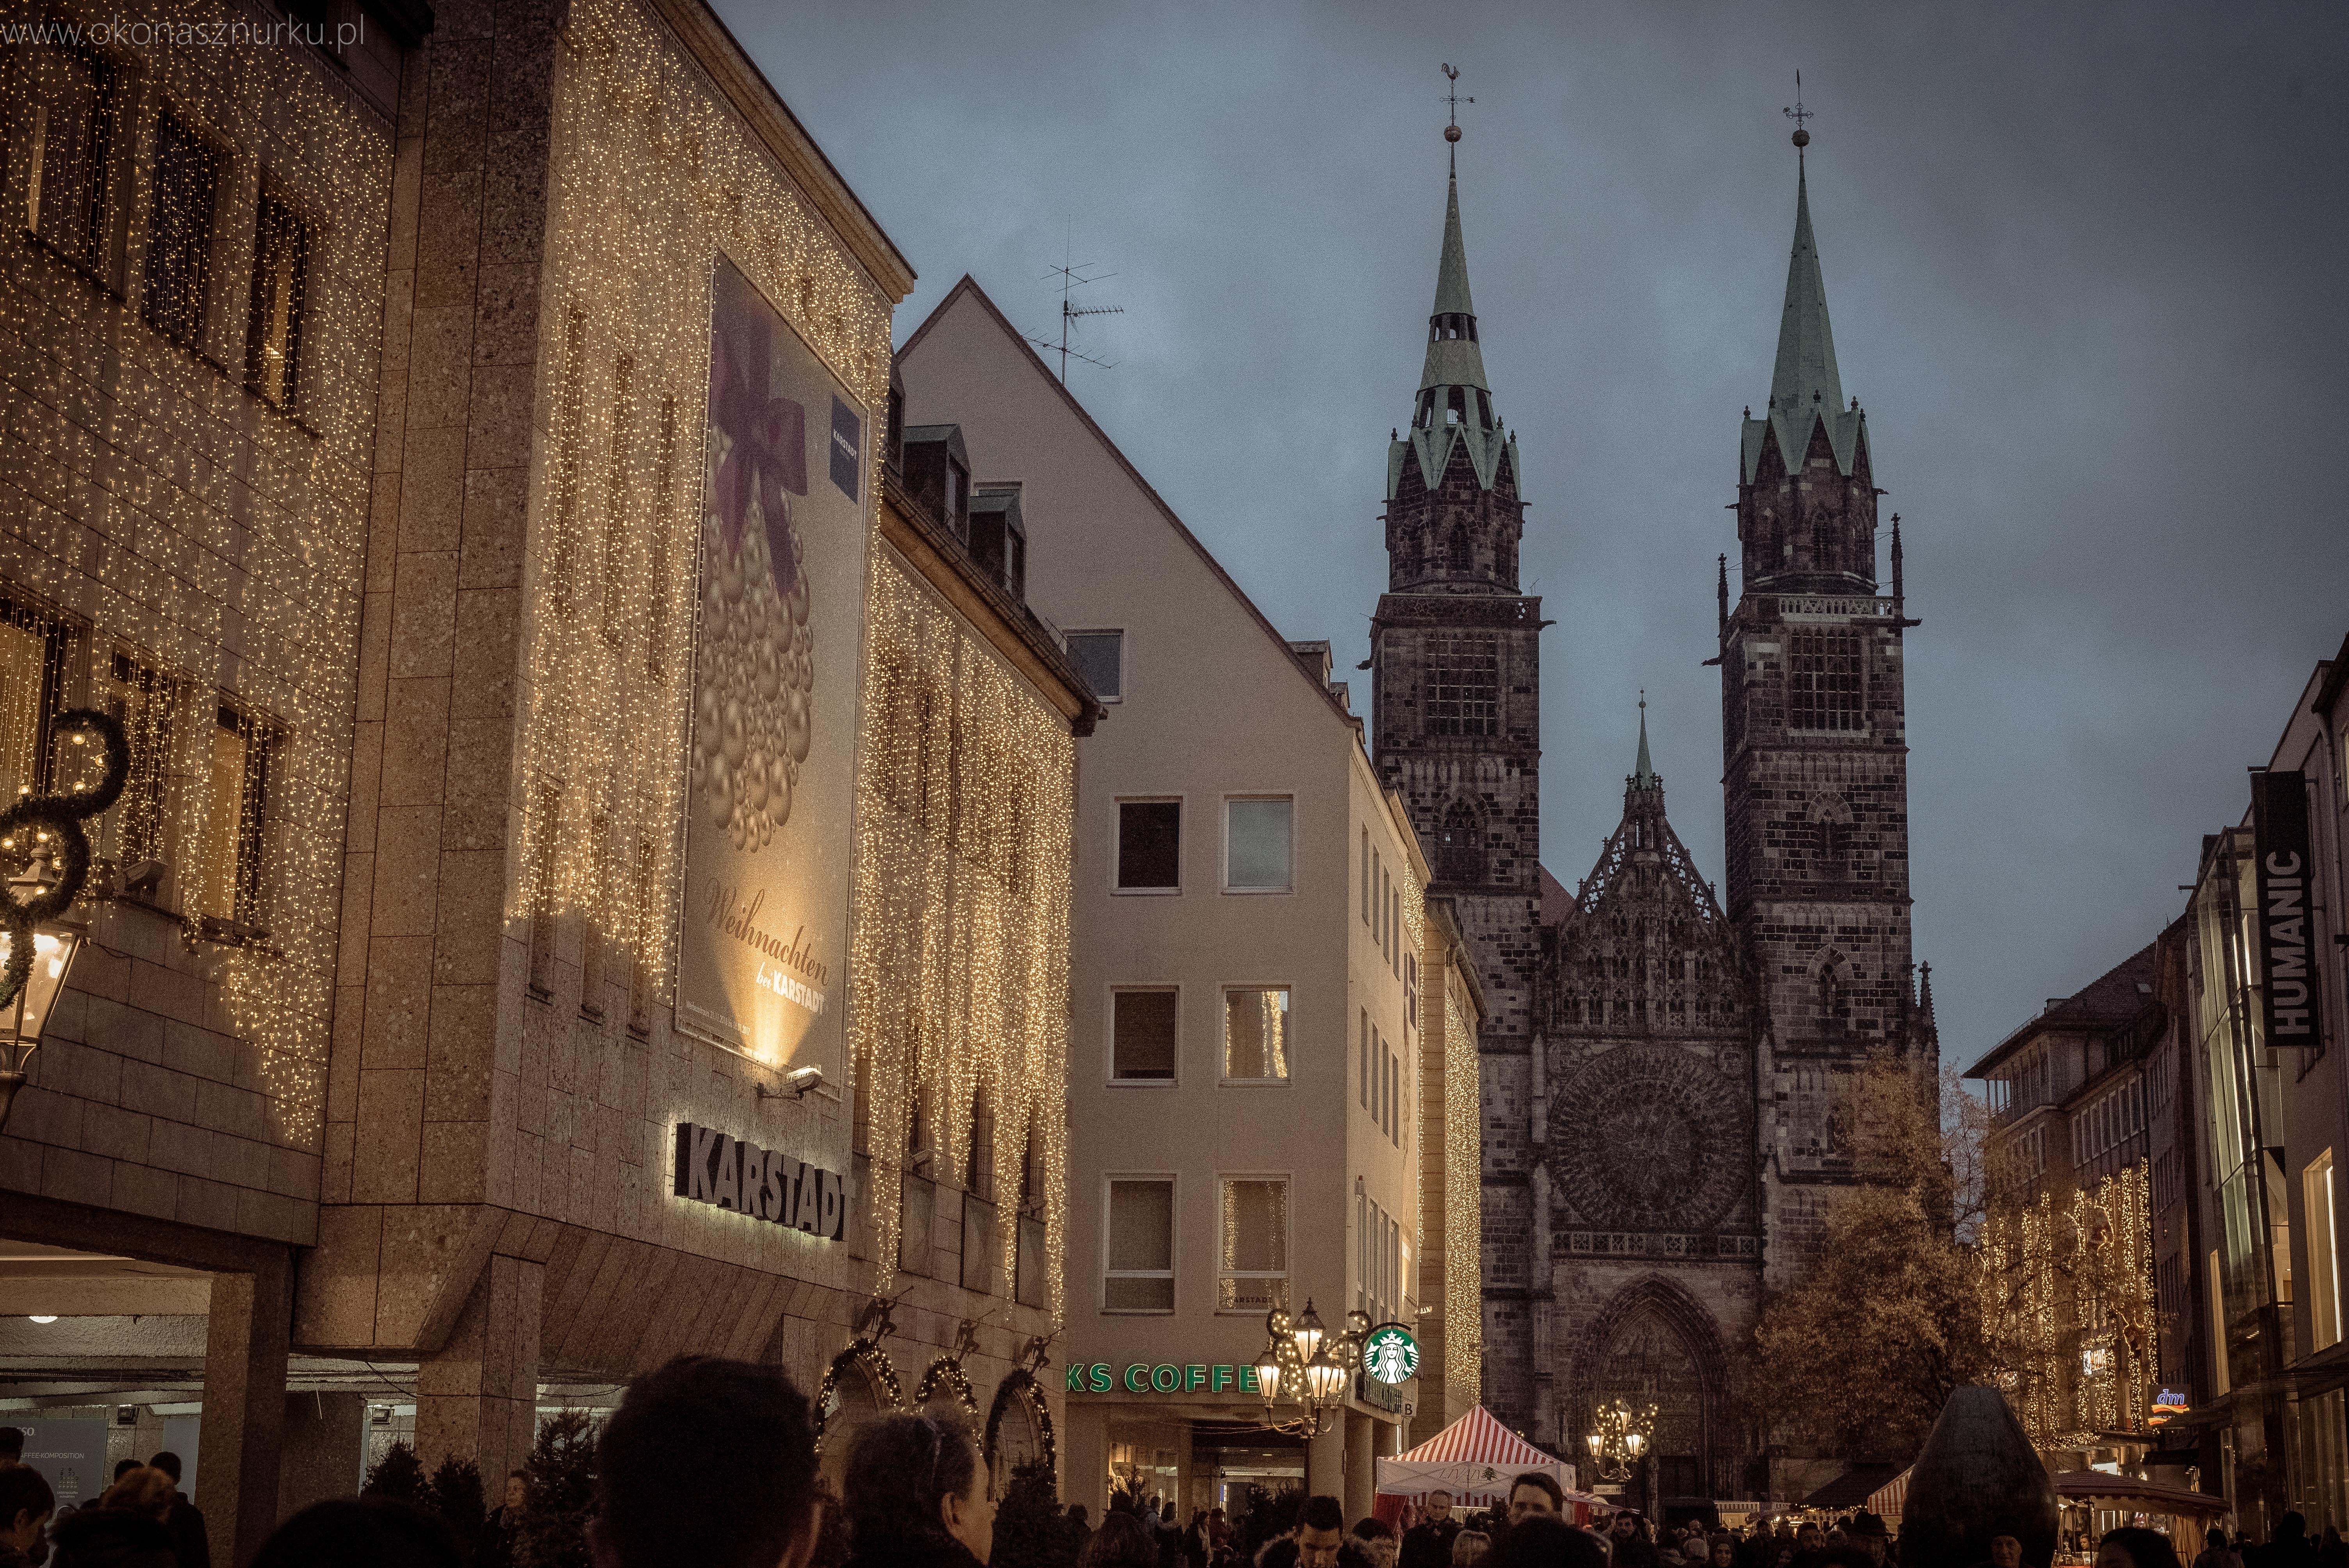 Nürnberg-stadt-norymberga-bayern-city-frankonia (11)